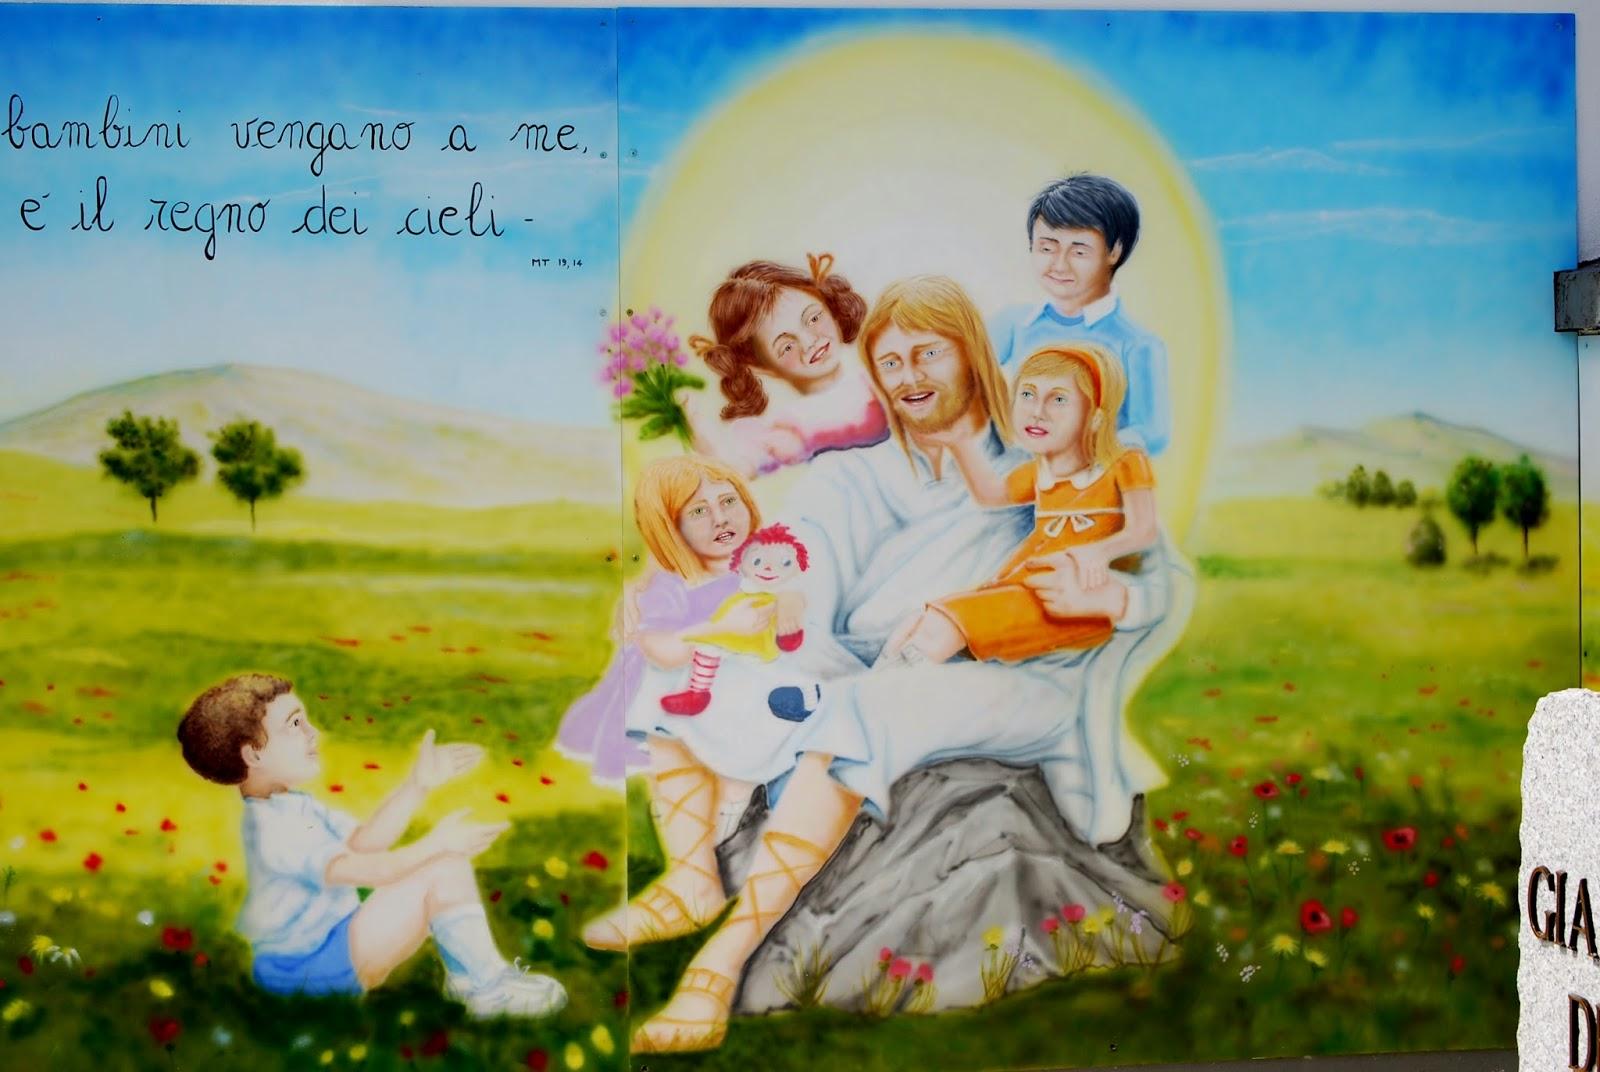 Roberta gandolfi murale ges e i bambini - Immagine di terra a colori ...